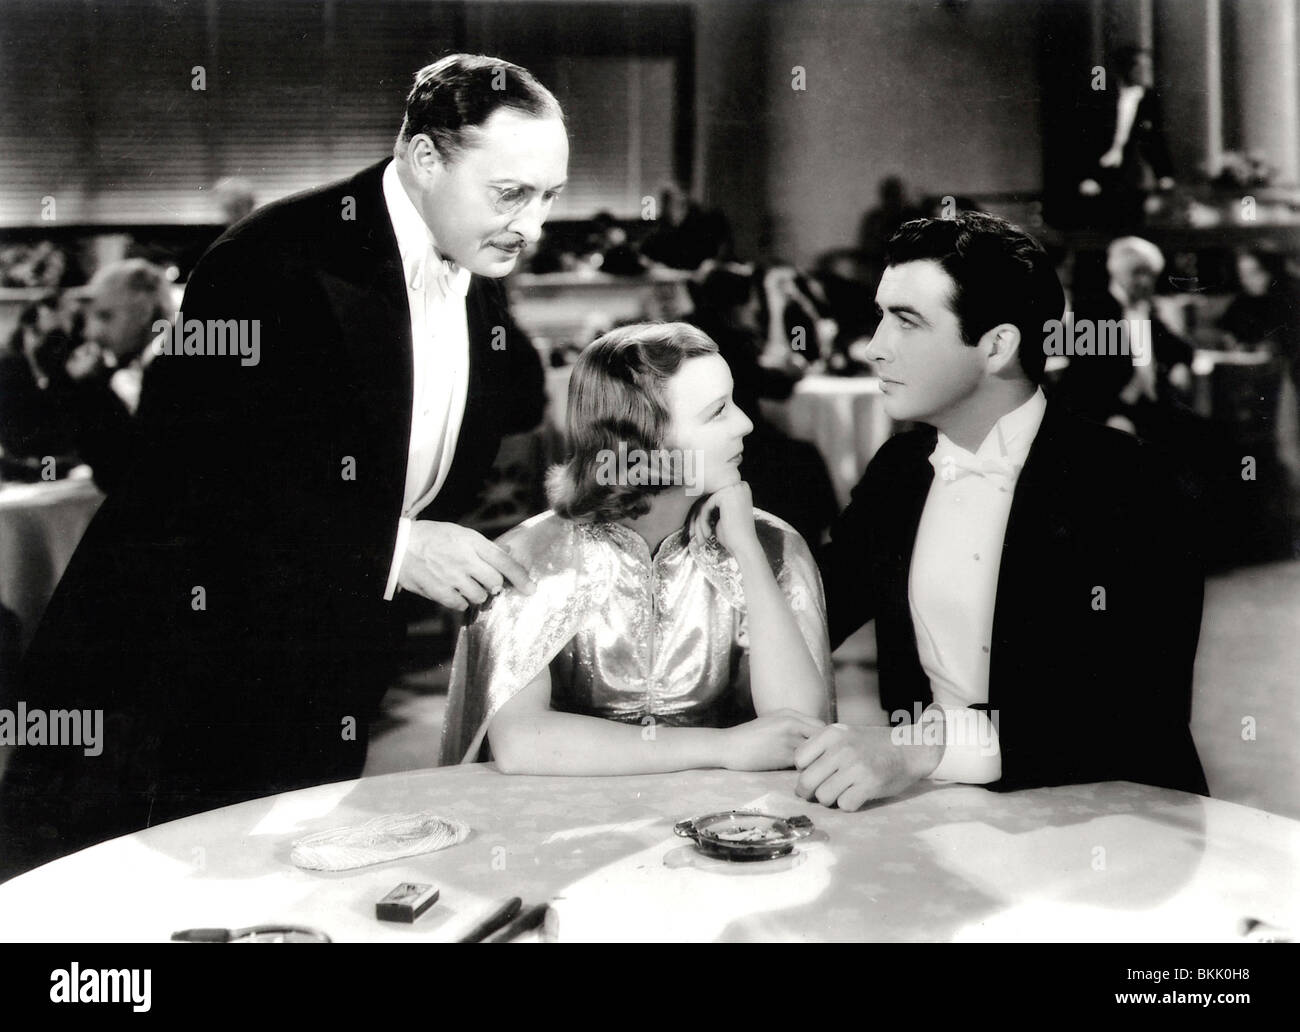 Tres camaradas (1938) Lionel Atwill, MARGARET SULLAVAN, Robert Taylor TREC 009 P Imagen De Stock